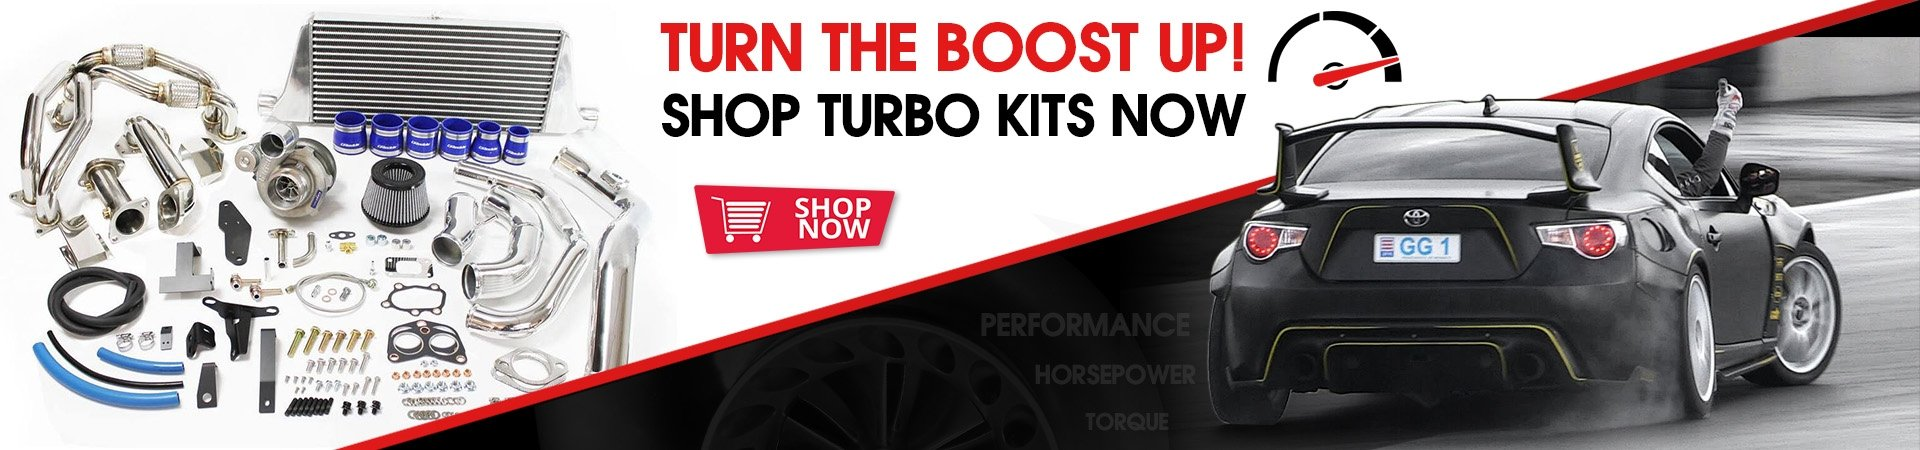 86 Speed - Scion FRS | Subaru BRZ | Toyota 86 Performance Parts